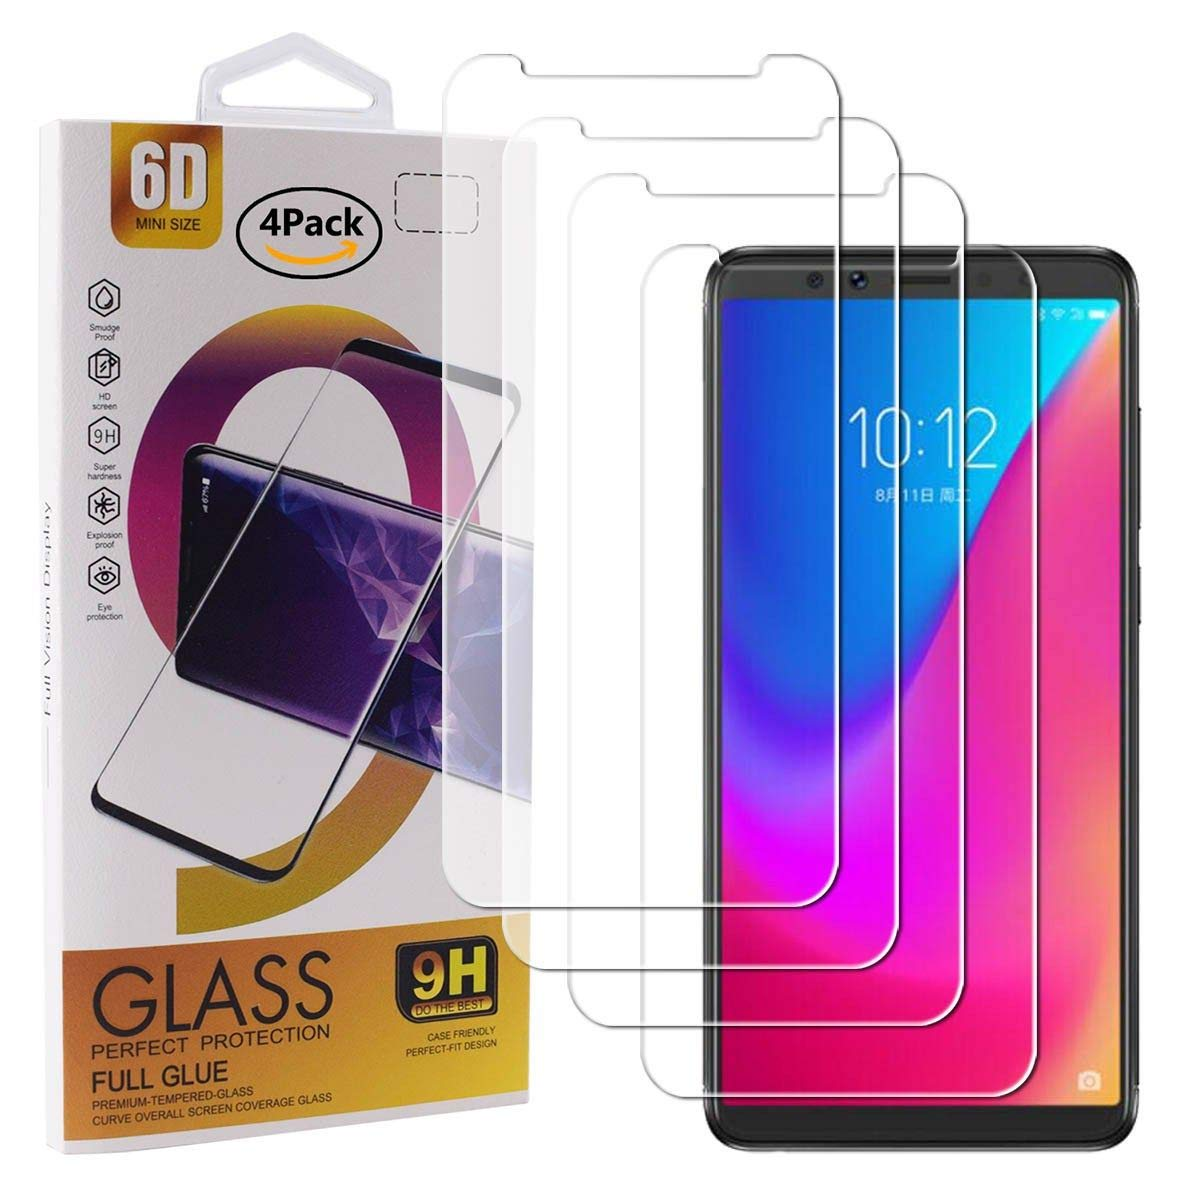 Guran 4 Paquete Cristal Templado Protector de Pantalla para Lenovo K5 Pro Smartphone 9H Dureza Anti-Ara?azos Alta Definicion Transparente Película: Amazon.es: Electrónica